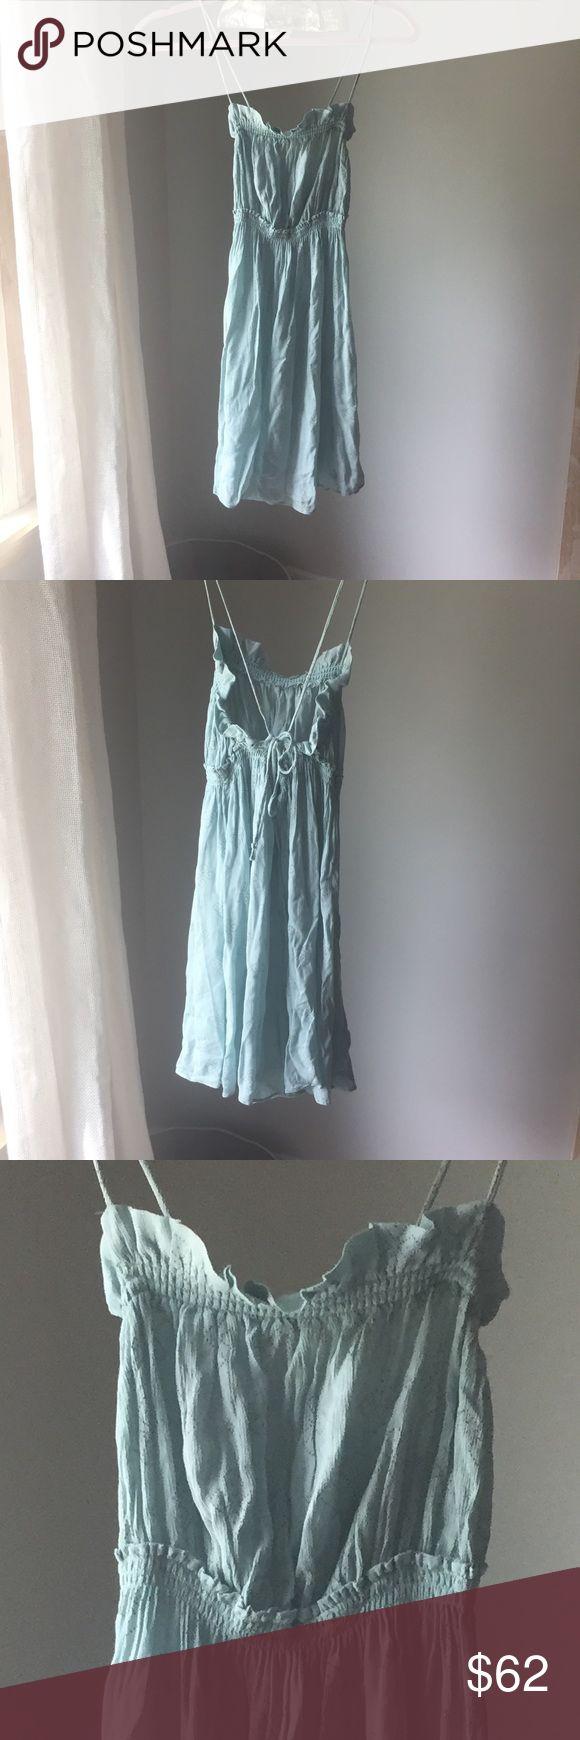 Lovely FP slip dress Wear it under a dress or over a slip, the loveliest shade of pale green blue, like a birds egg, dainty ruffle, adjustable ties Free People Dresses